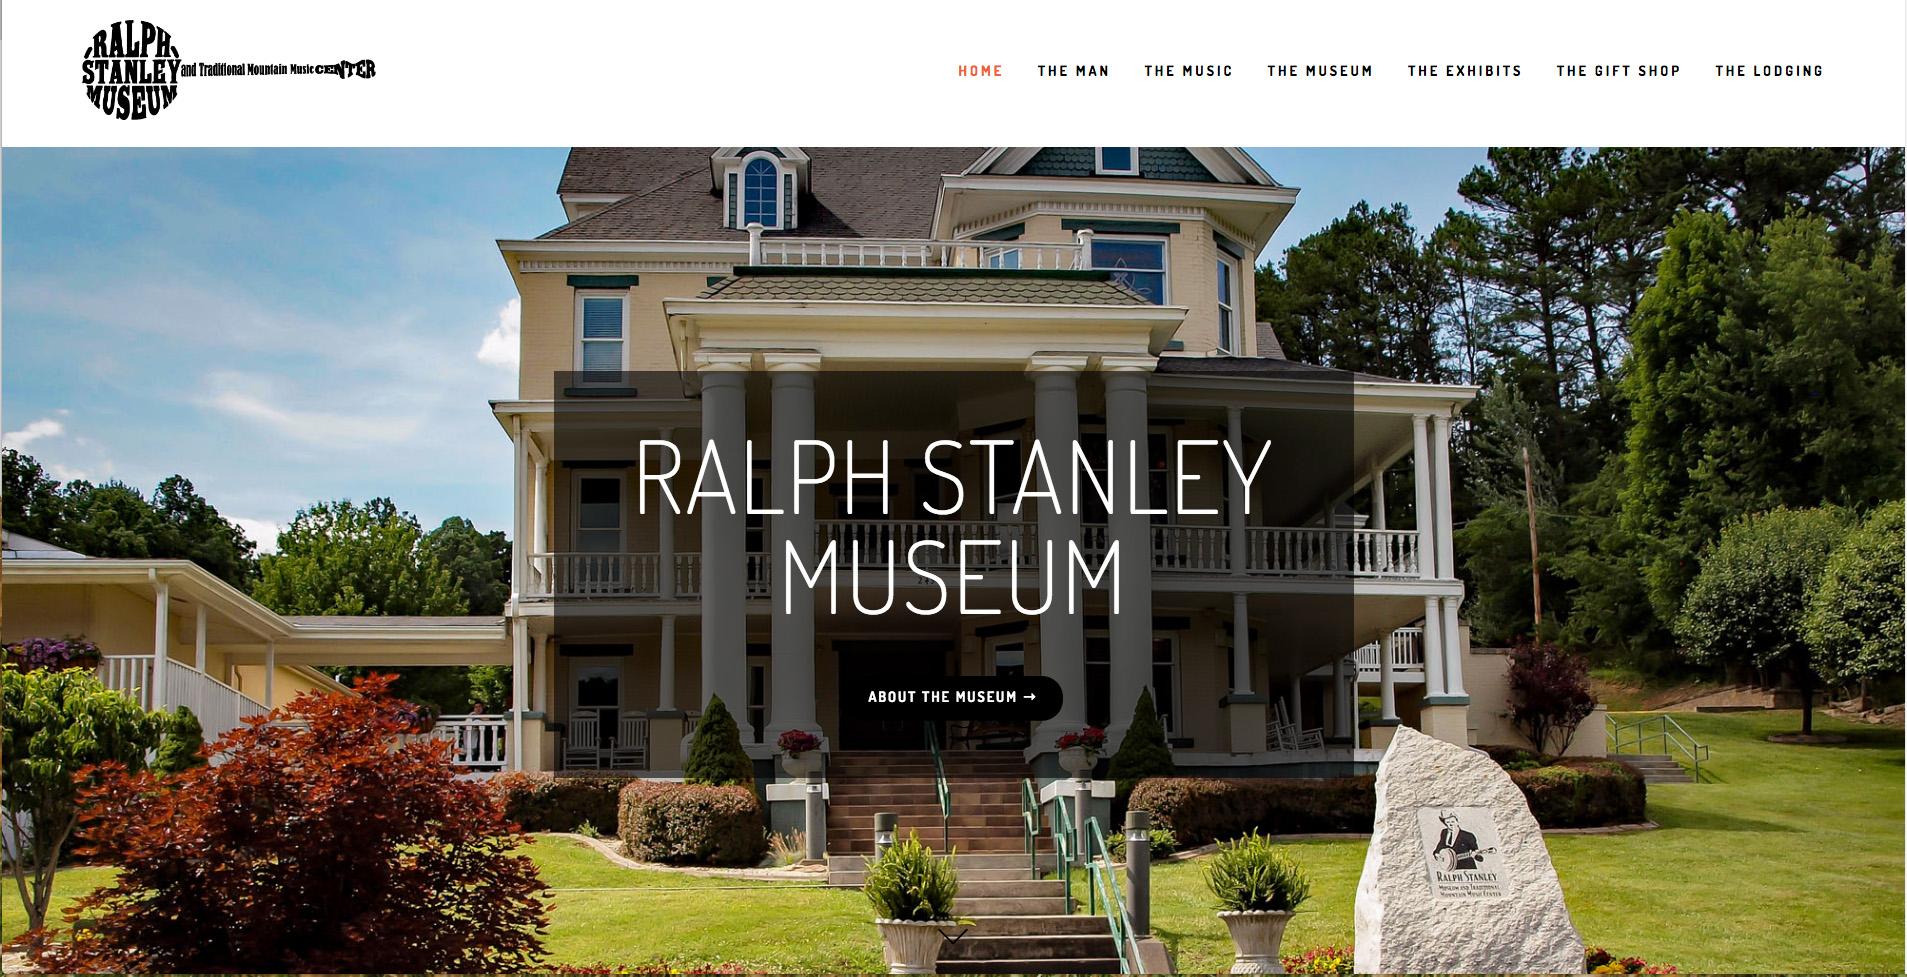 Ralph Stanley Museum